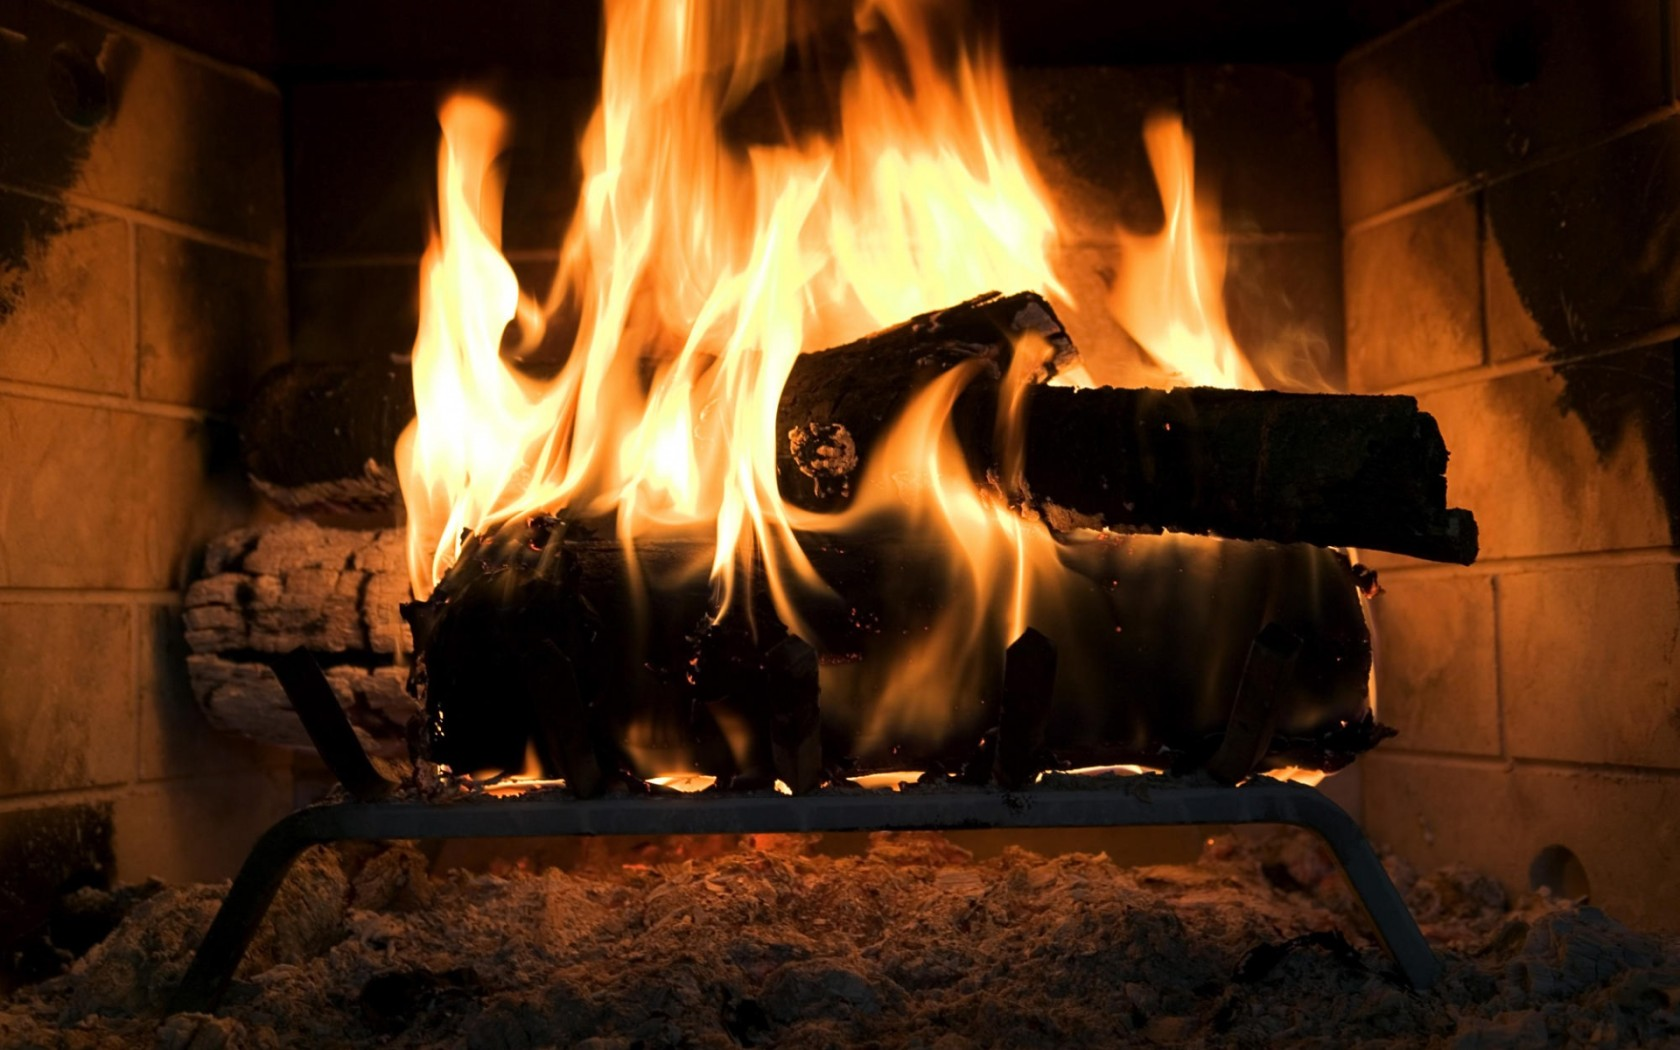 НАША Кофейня - Страница 17 Creative_Wallpaper_The_fire_in_the_fireplace_019215_